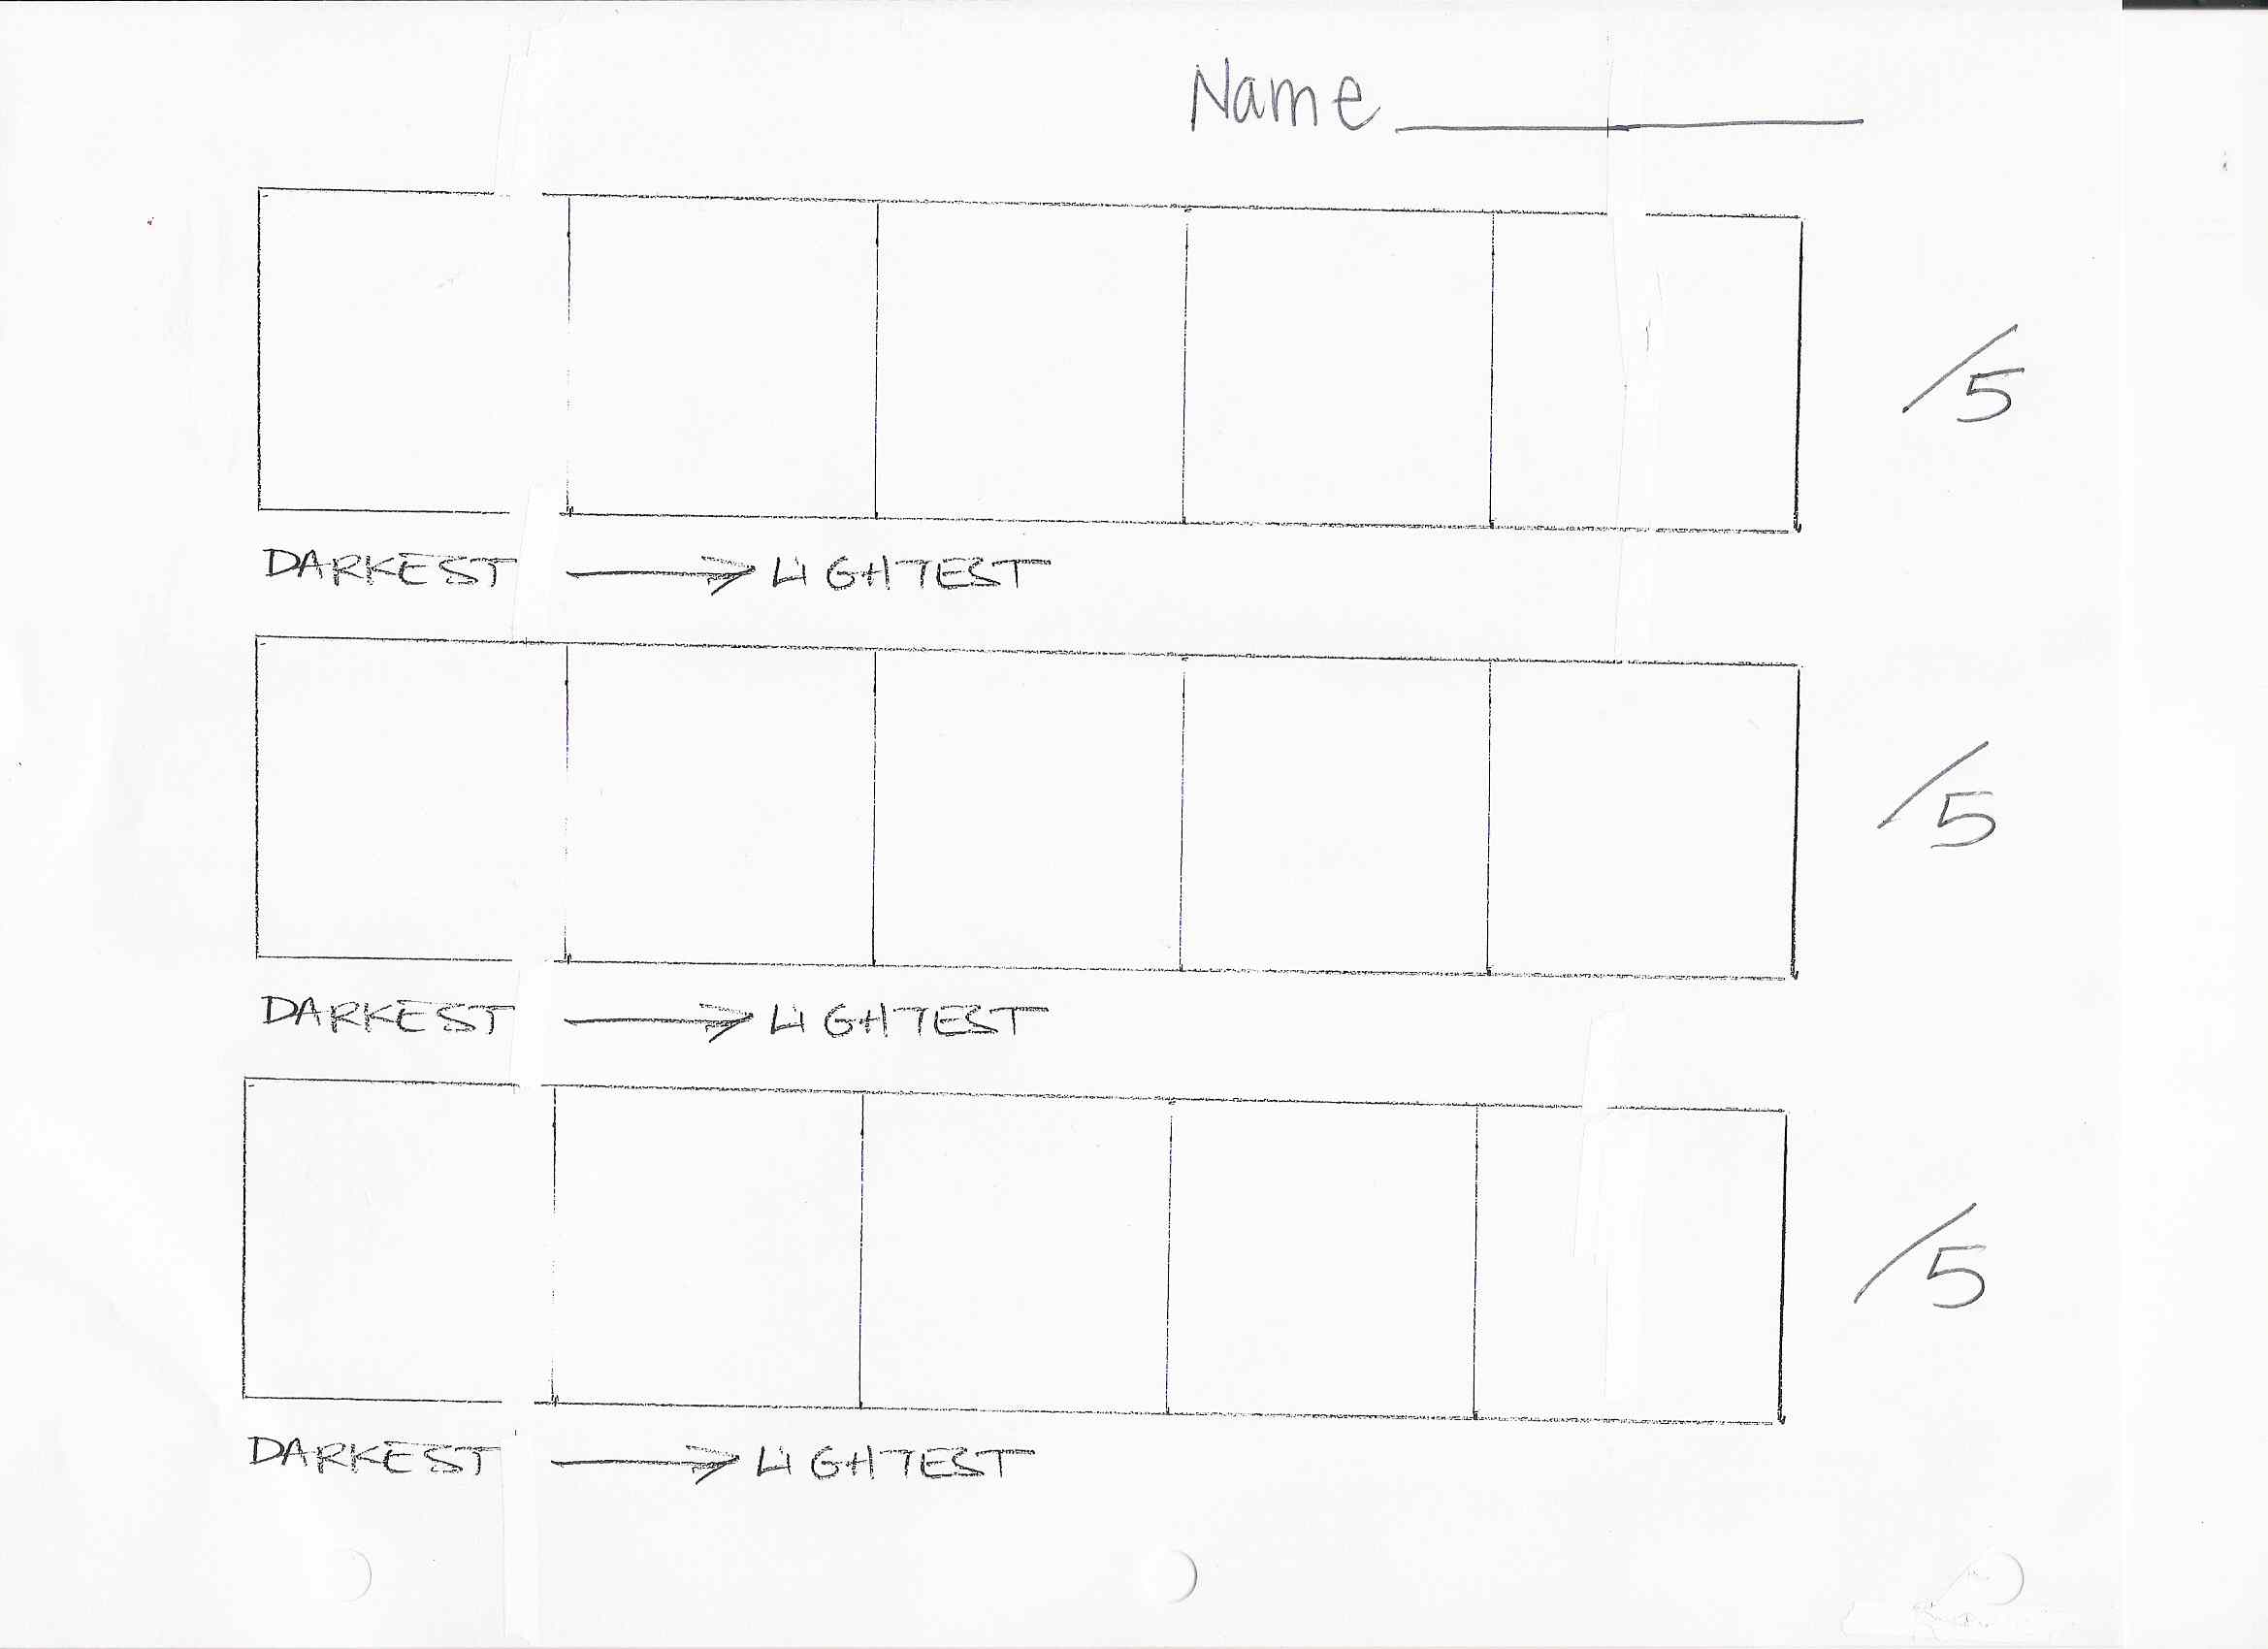 Value Drawing Worksheet Todd Stahl 45 Revolutions Per Minute September Ink Value Drawing